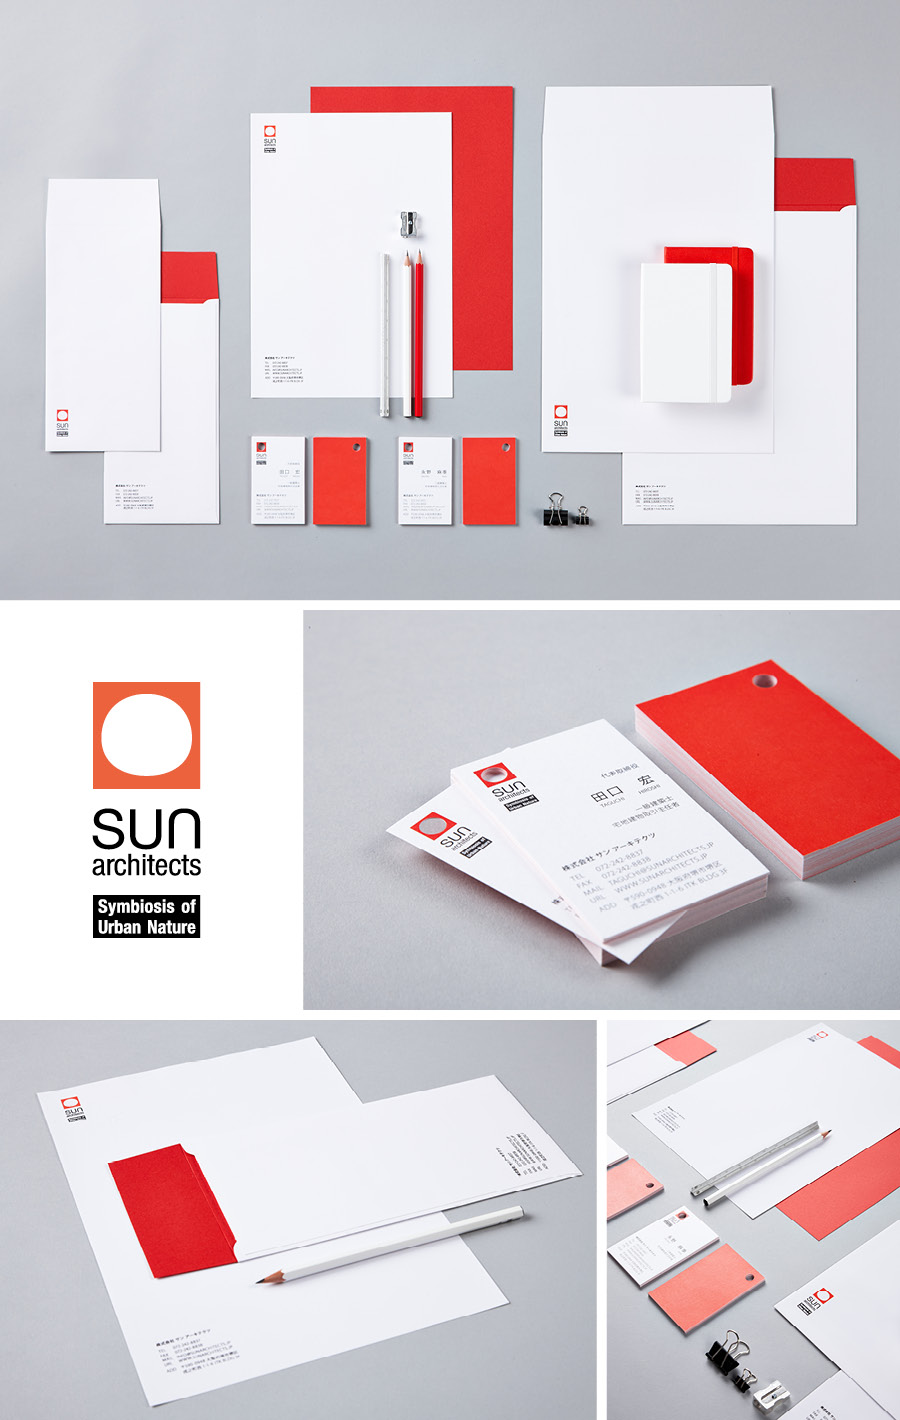 silent_sun_architects_01